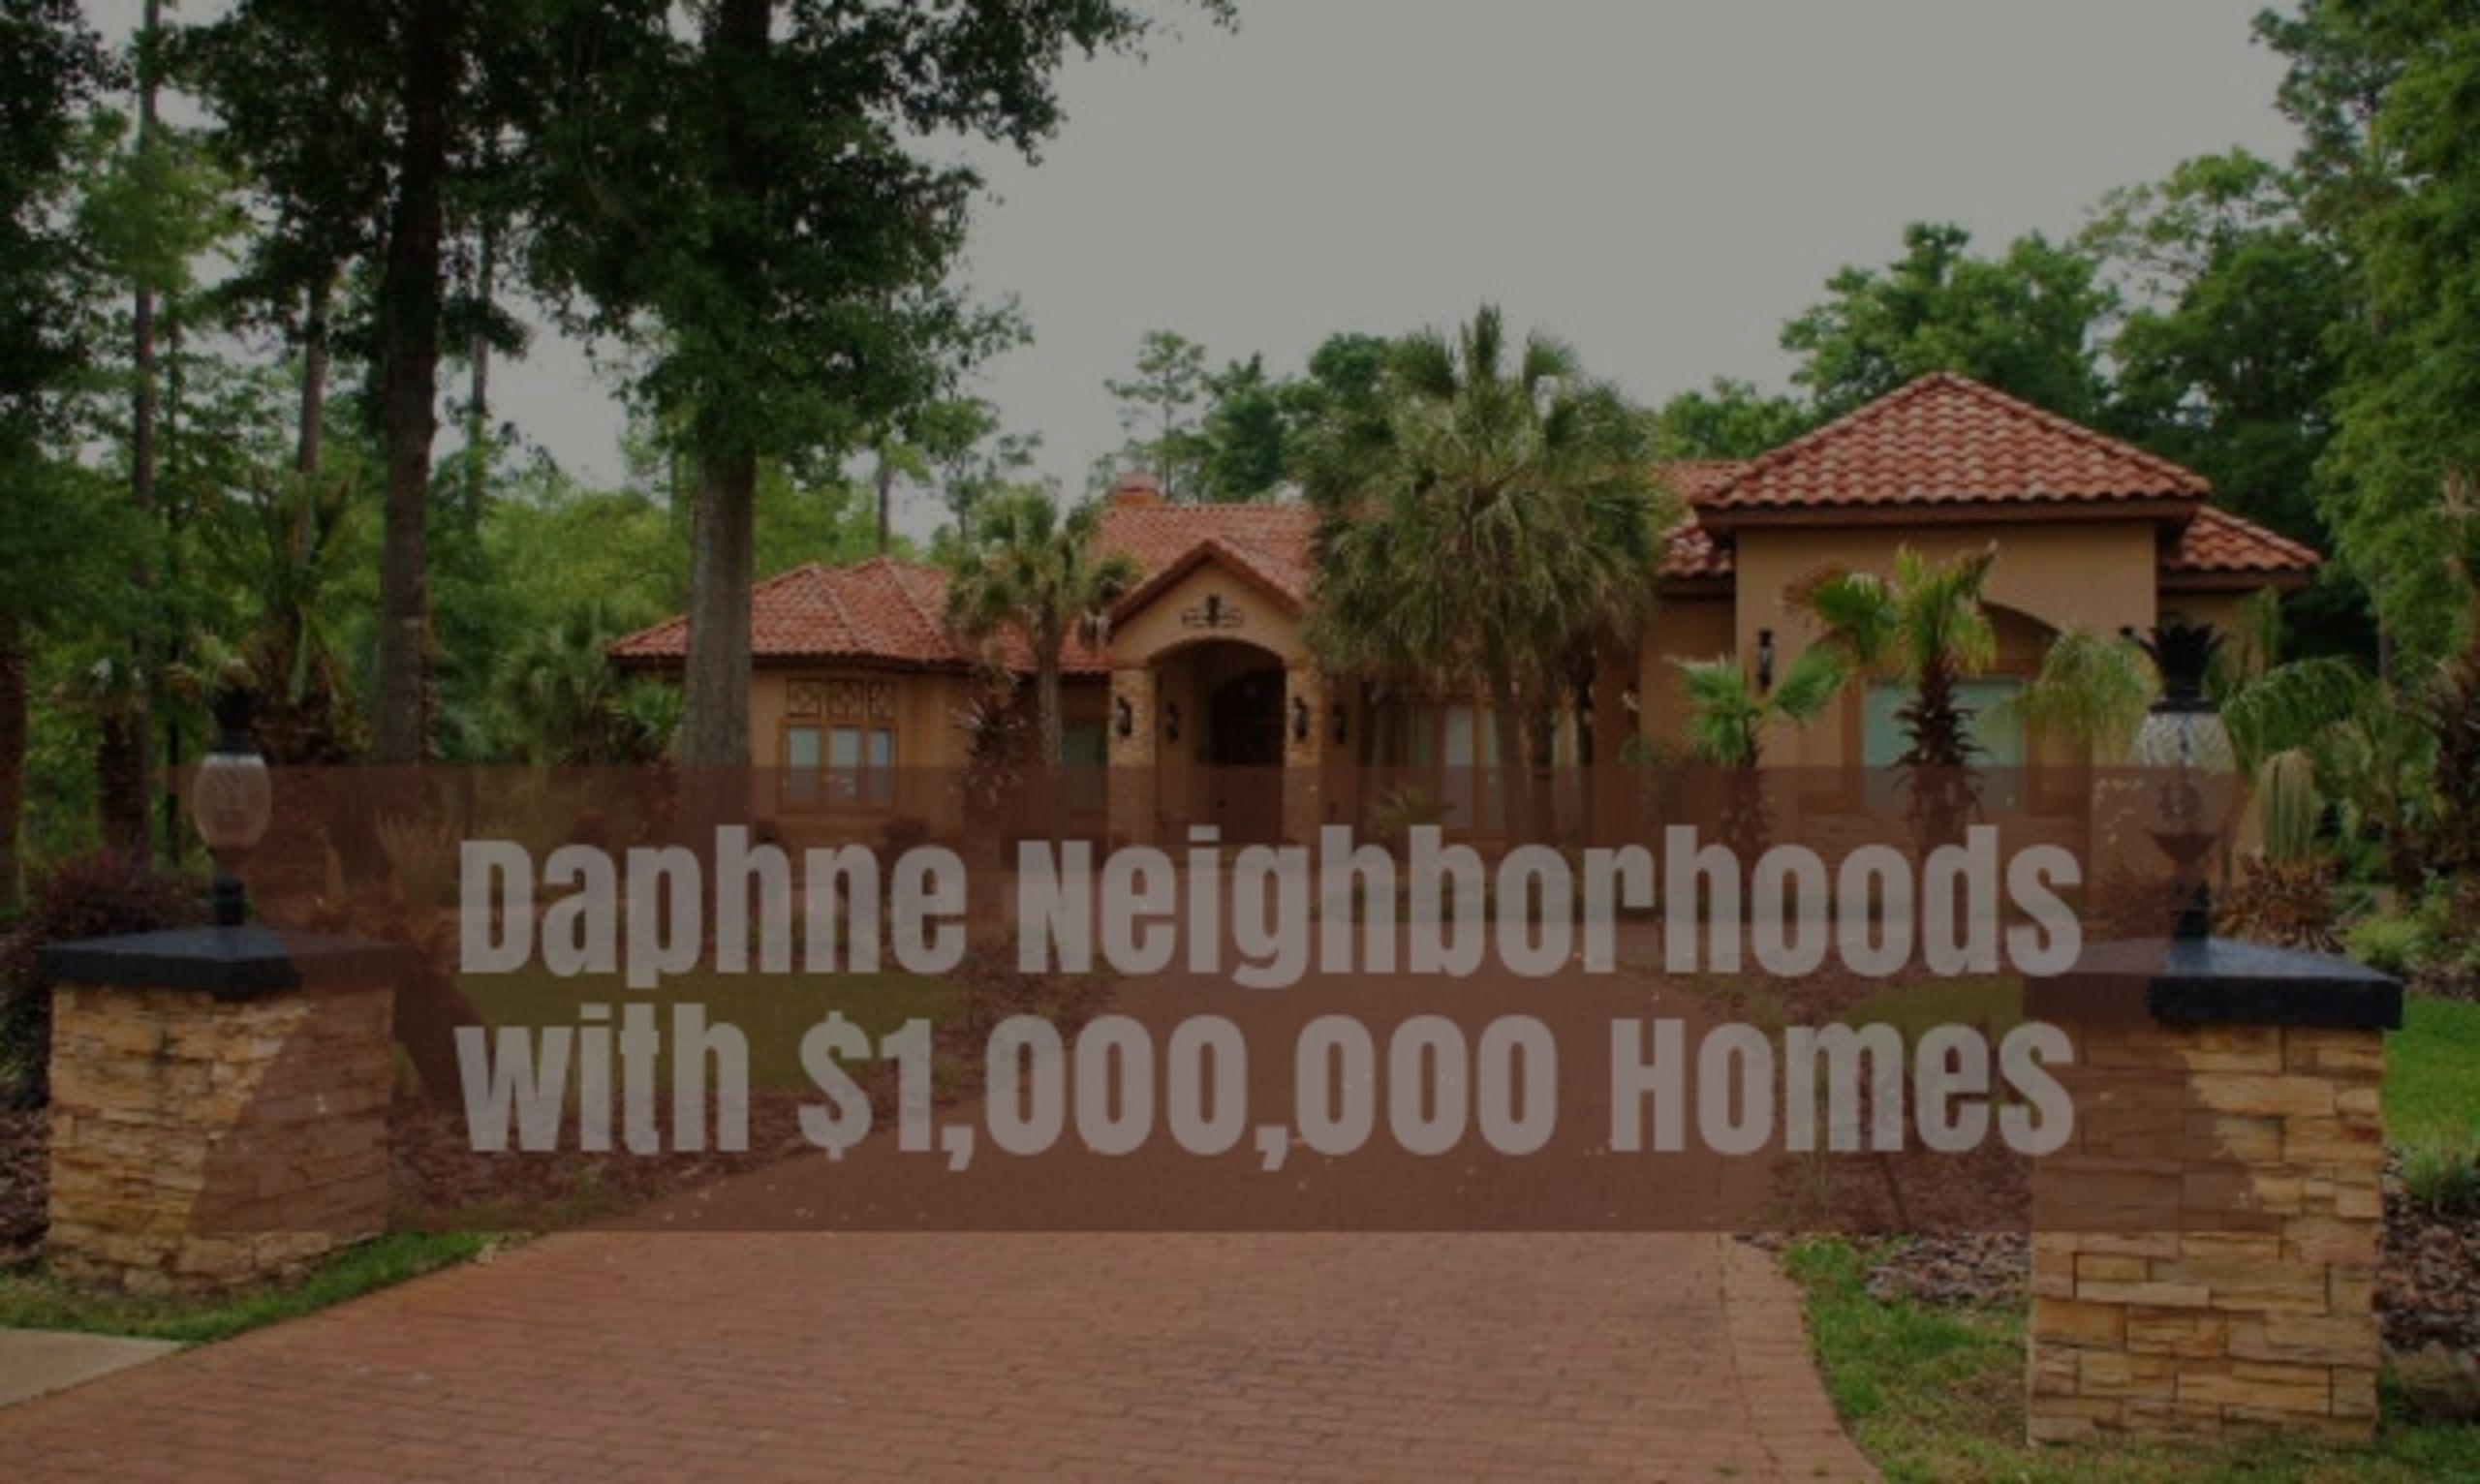 Daphne Neighborhoods with $1,000,000 Homes